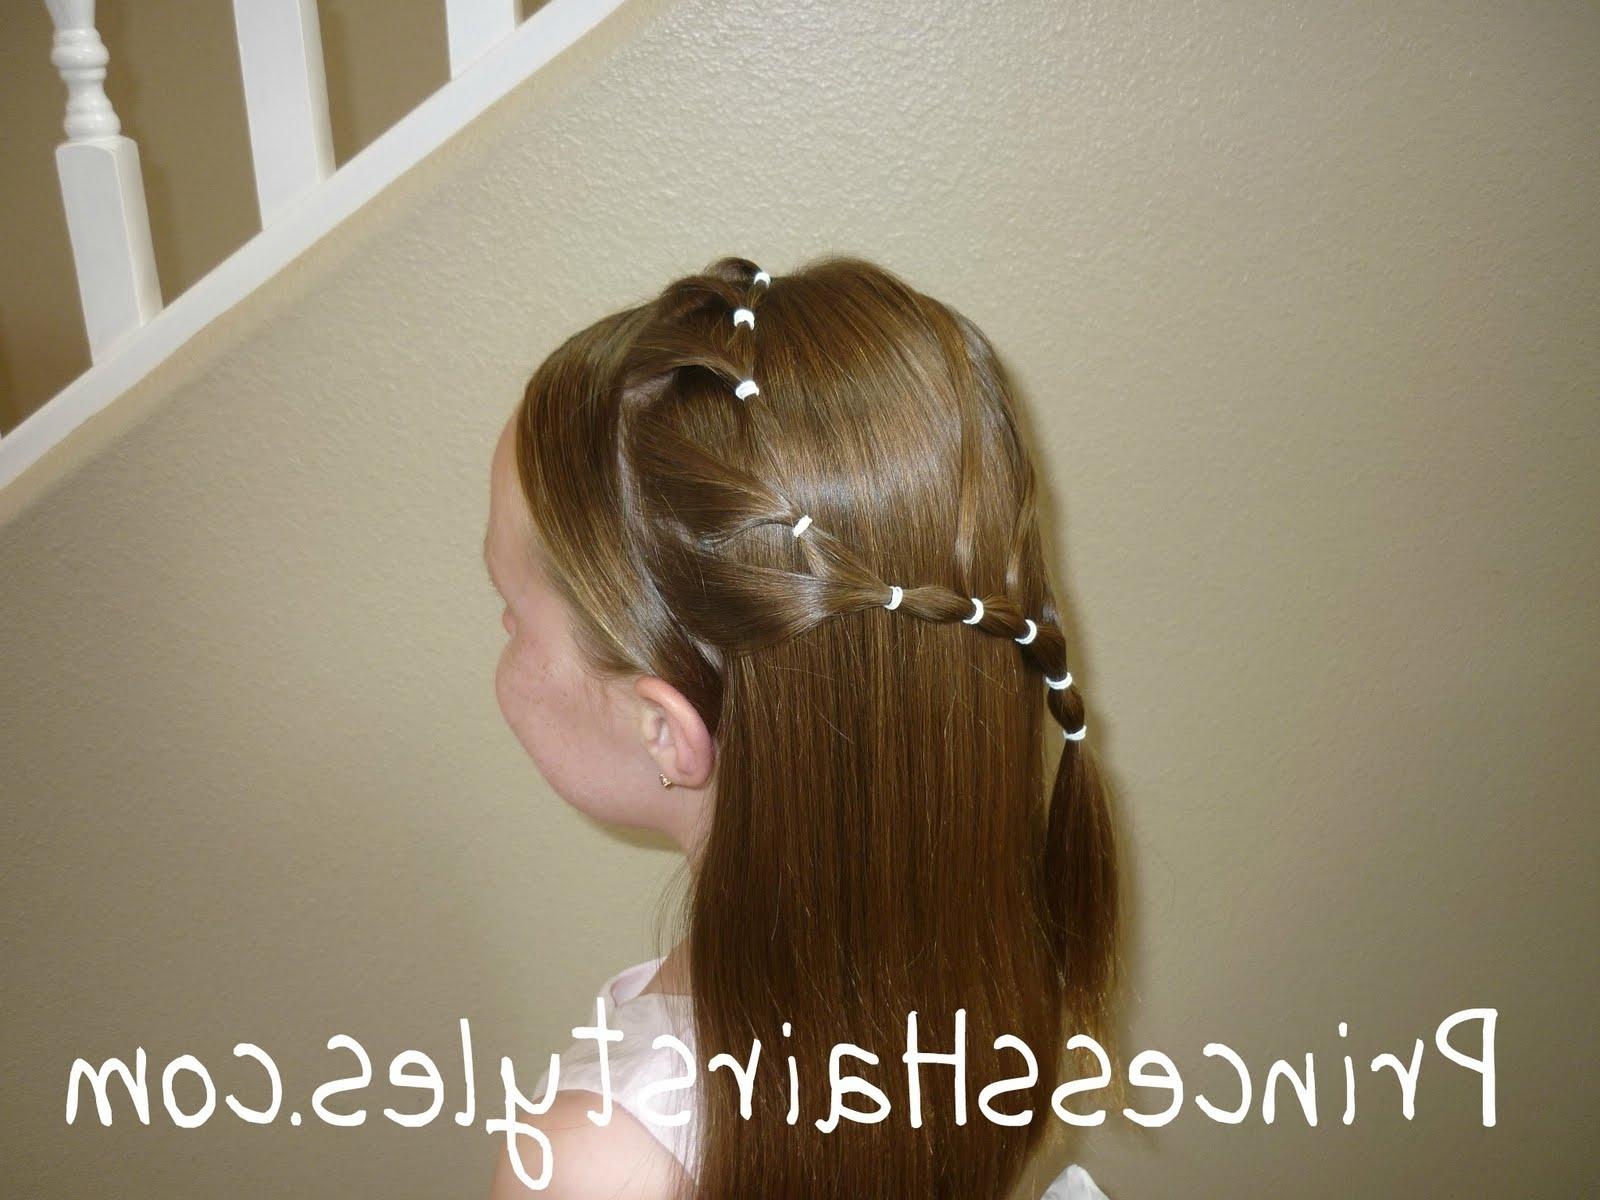 Preferred Long Curvy Braids Hairstyles Pertaining To Elastic Curvy Braid Hairstyle – Hairstyles For Girls – Princess (View 15 of 15)